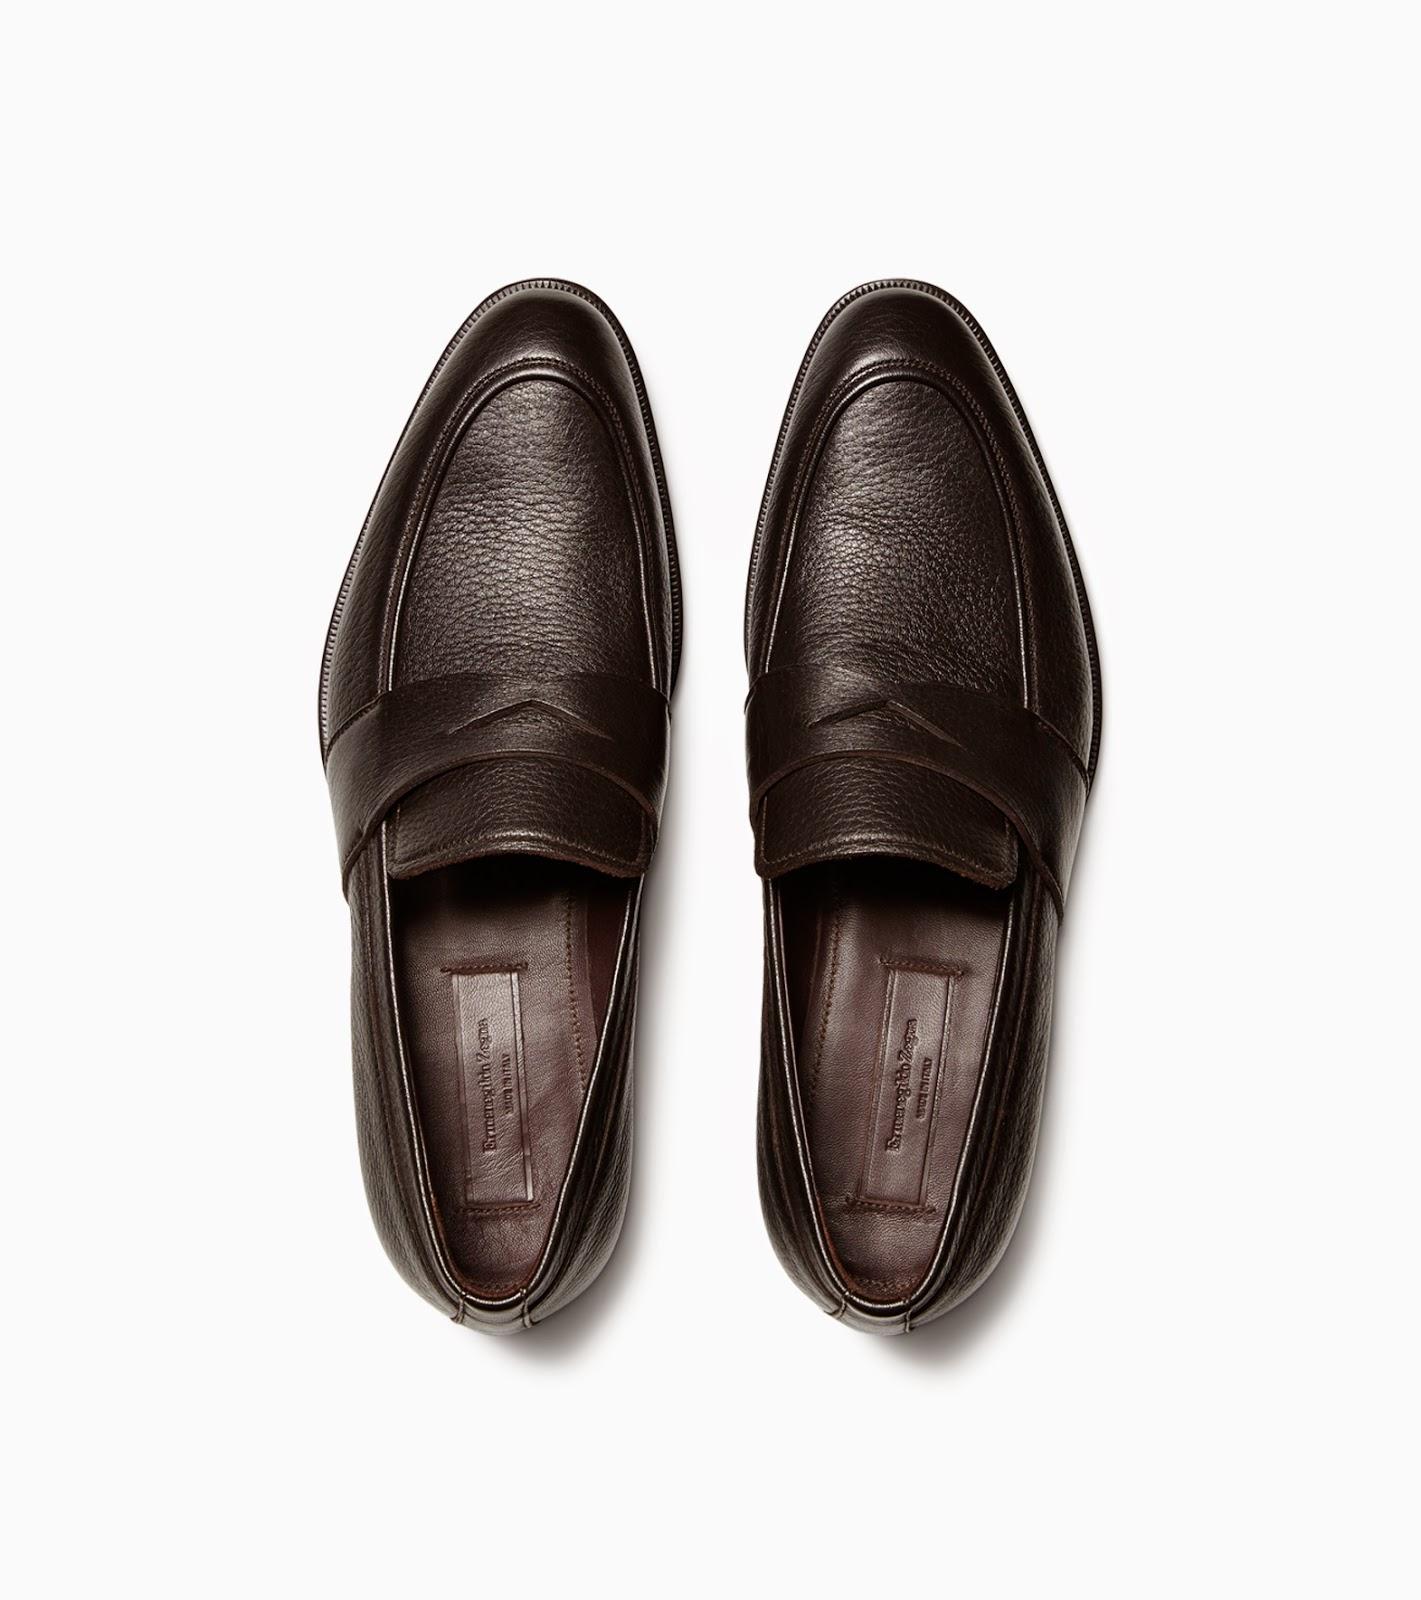 b2e72c9e400 Ermenegildo Zegna Flex Shoes - Comfort For Style Should Not Be Compromised